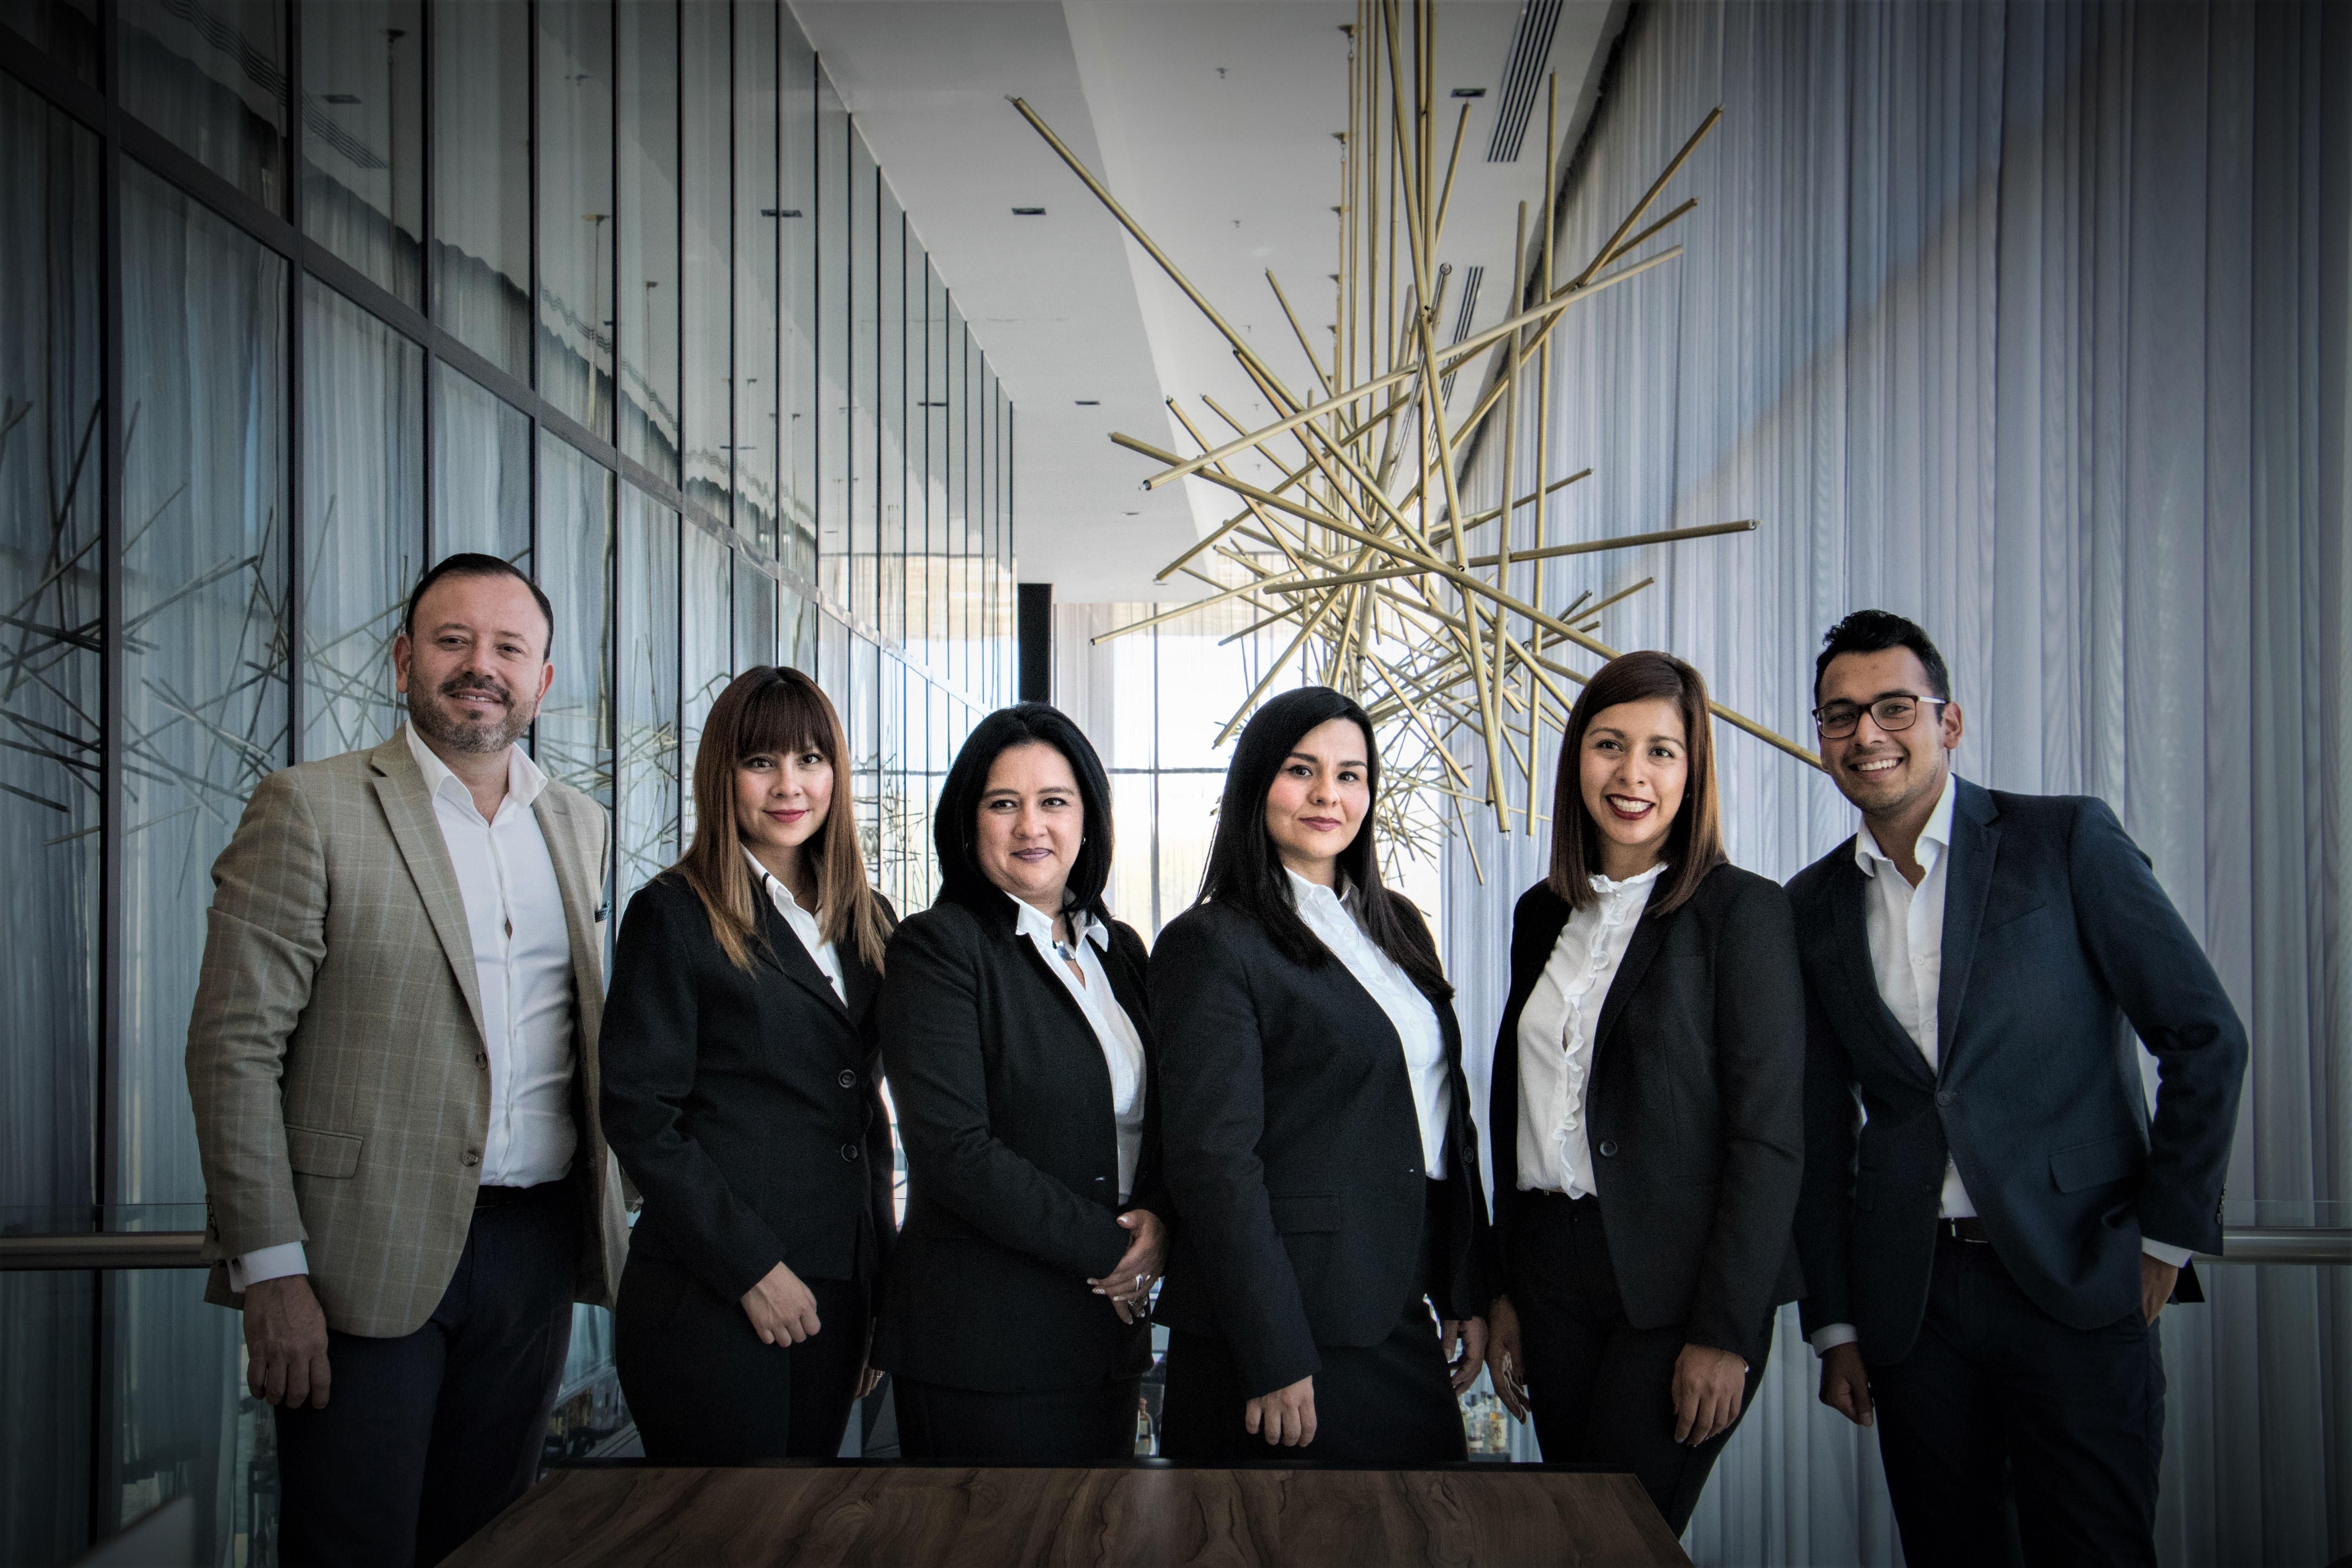 career-corporate-job-776615